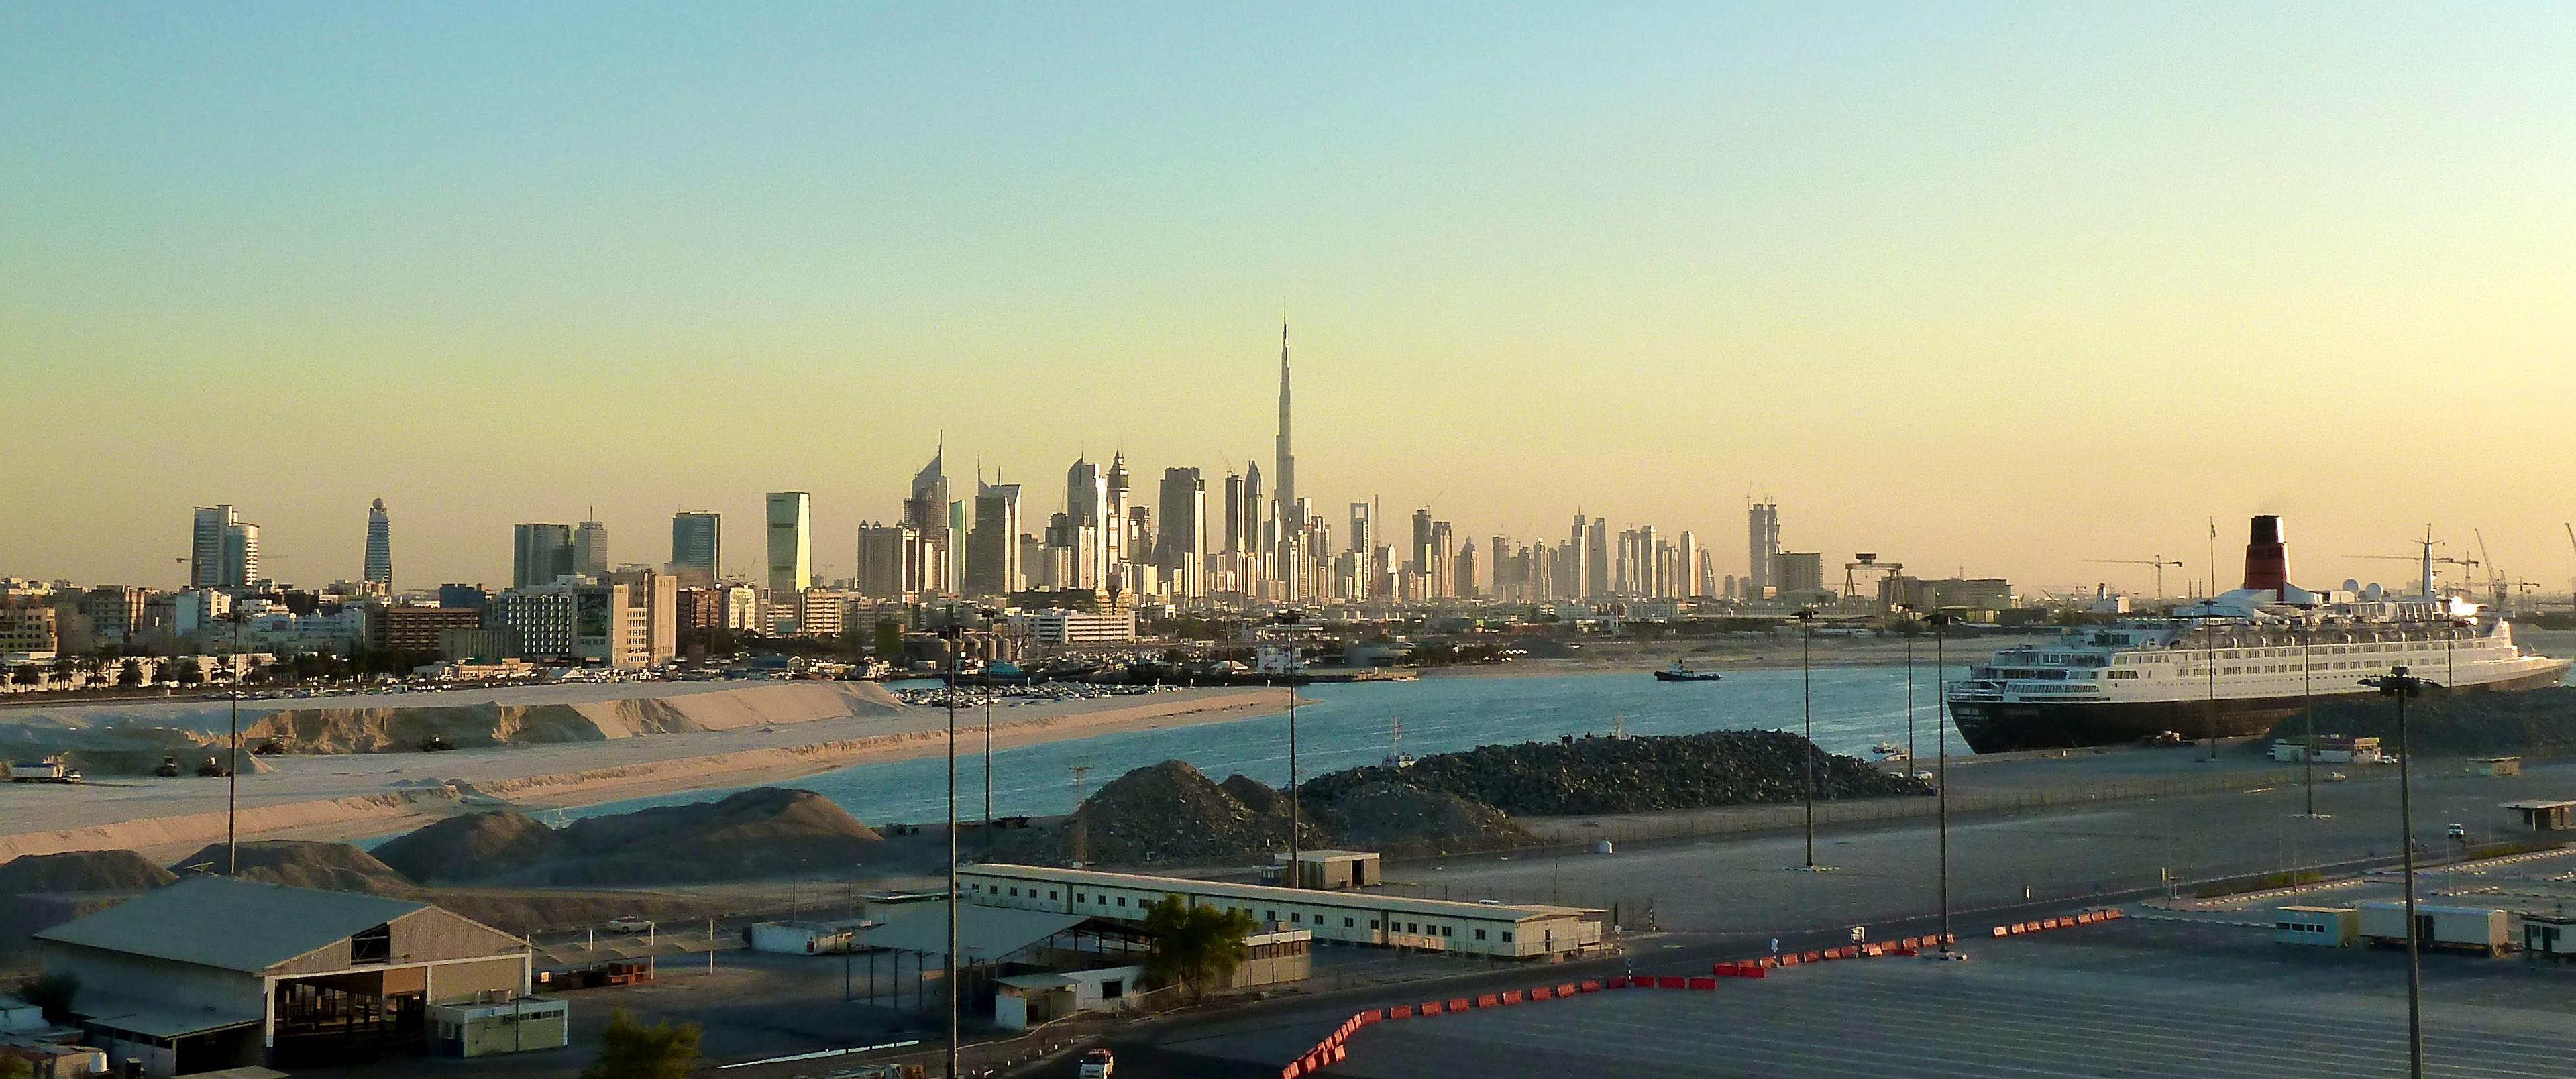 File:Dubai's skyline at dawn.jpg - Wikimedia Commons